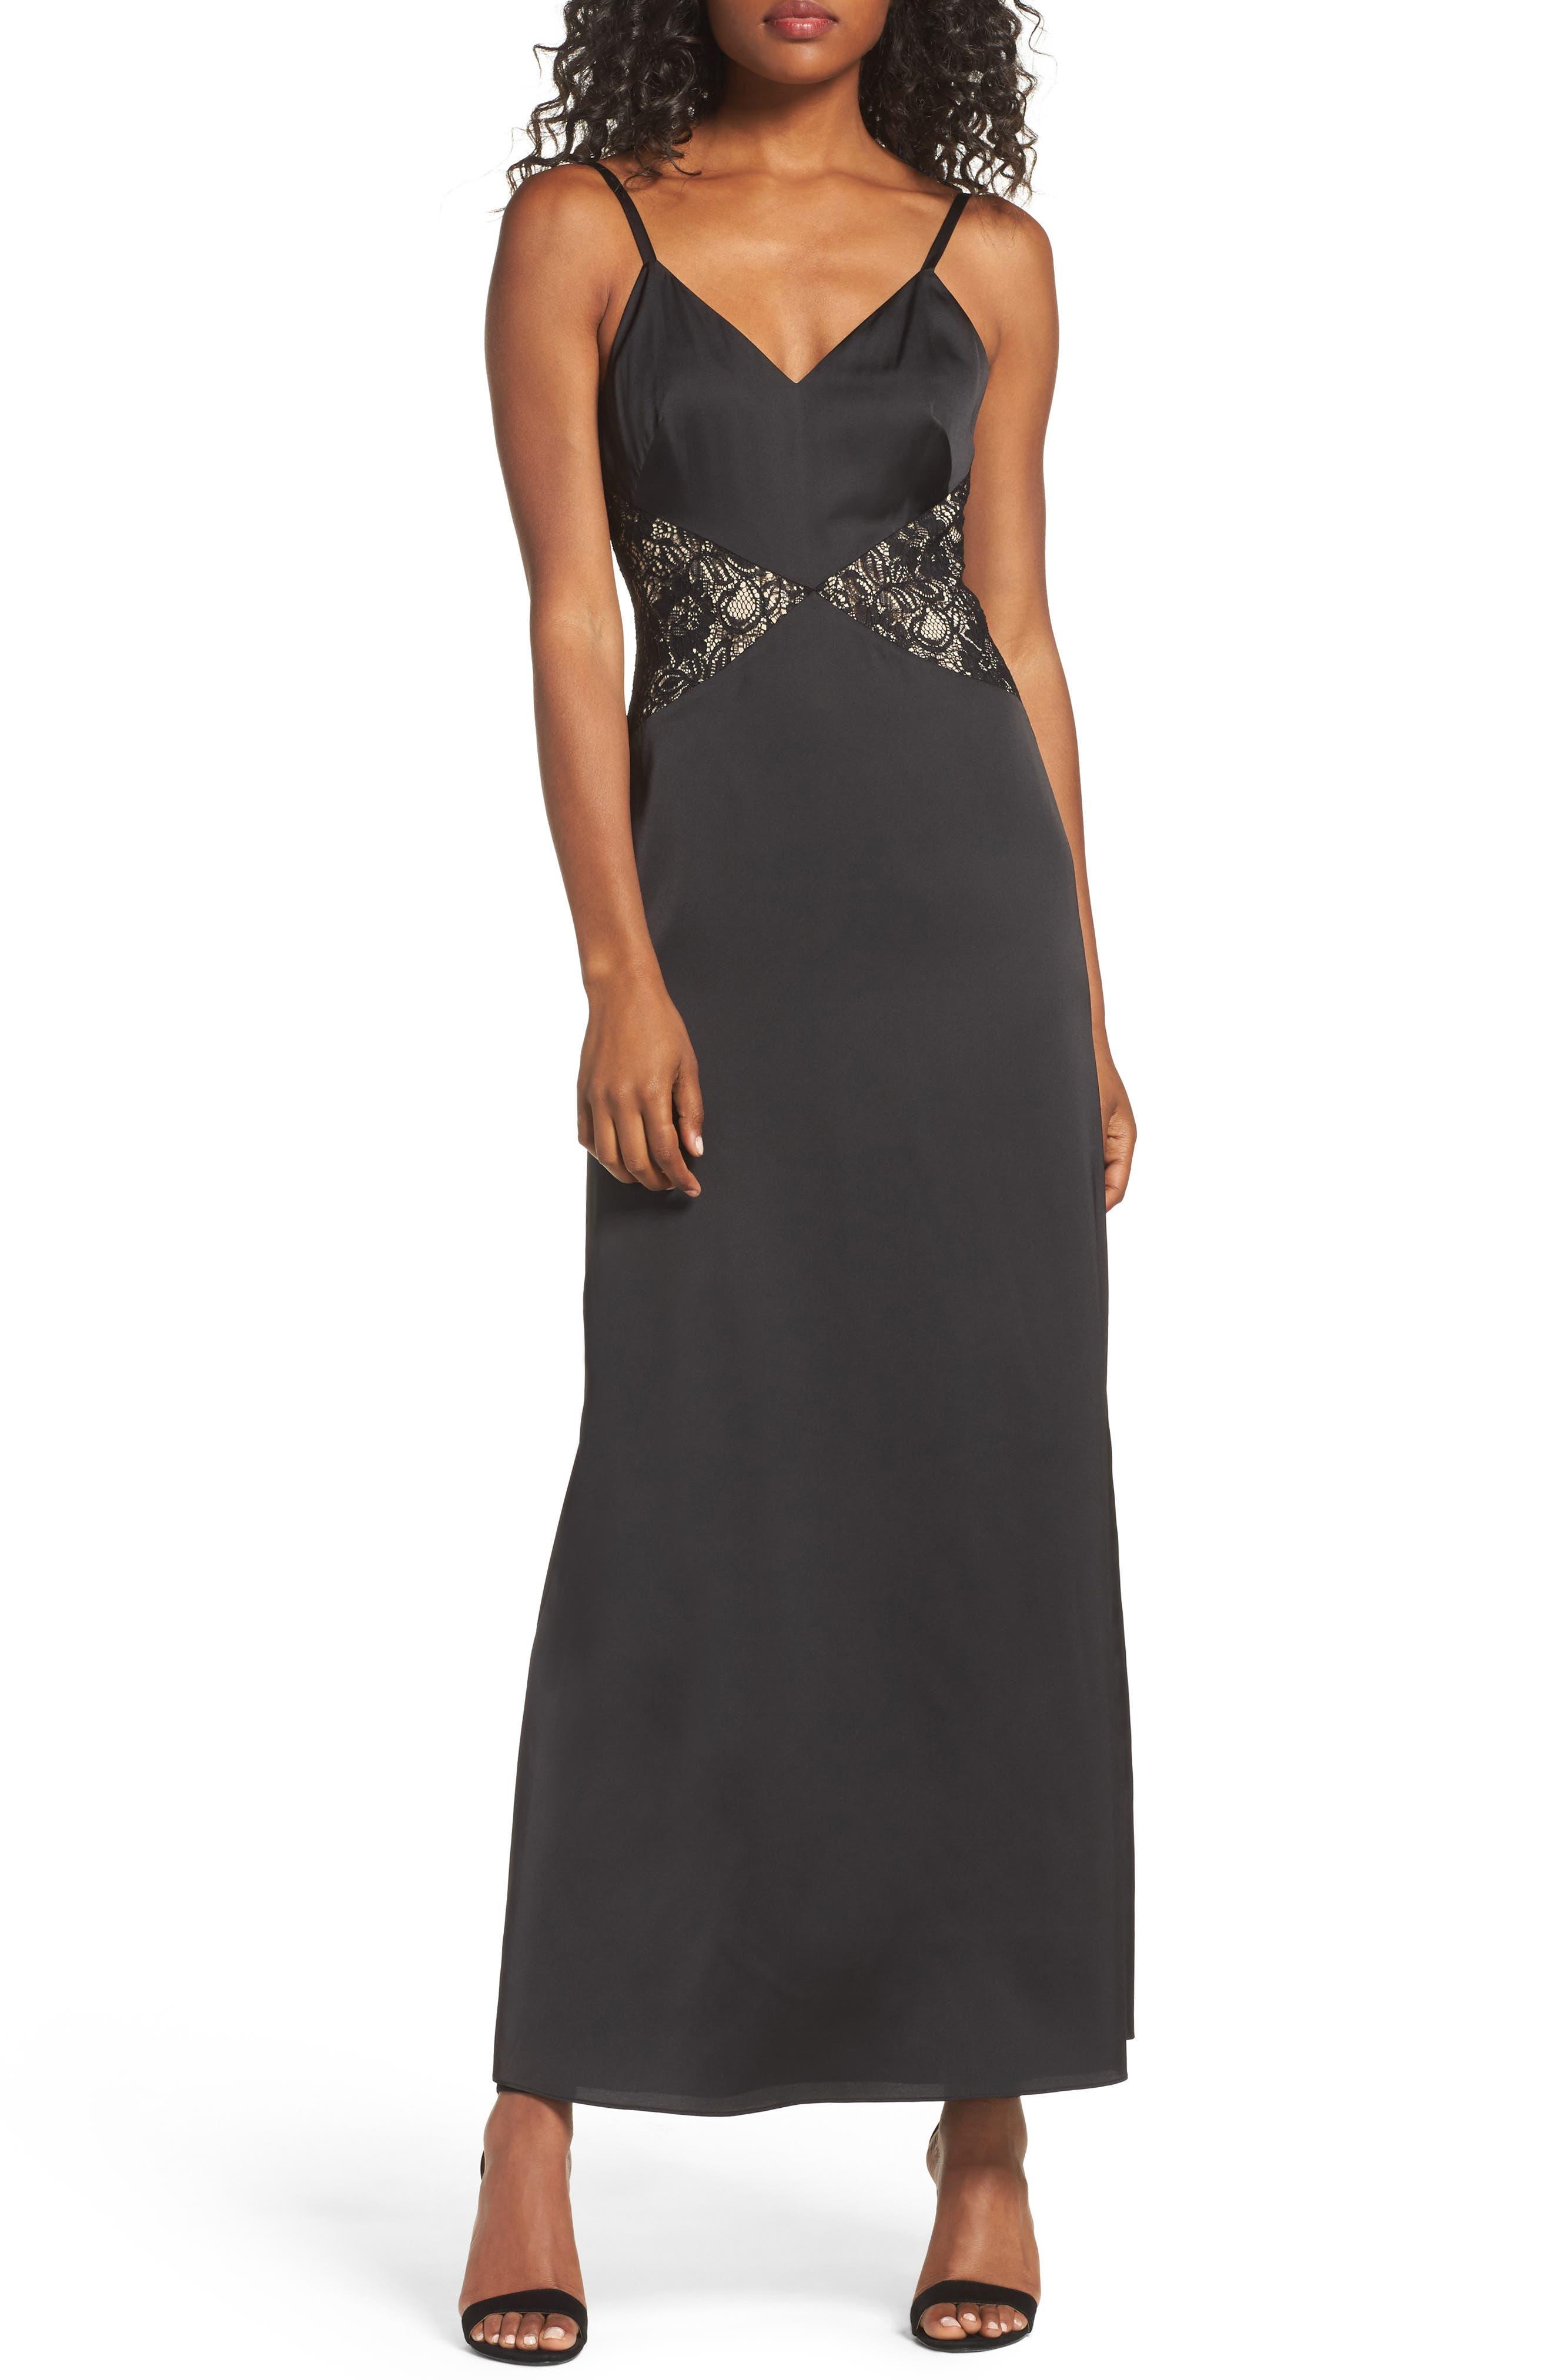 Main Image - Ali & Jay Femme Fatale Slip Dress